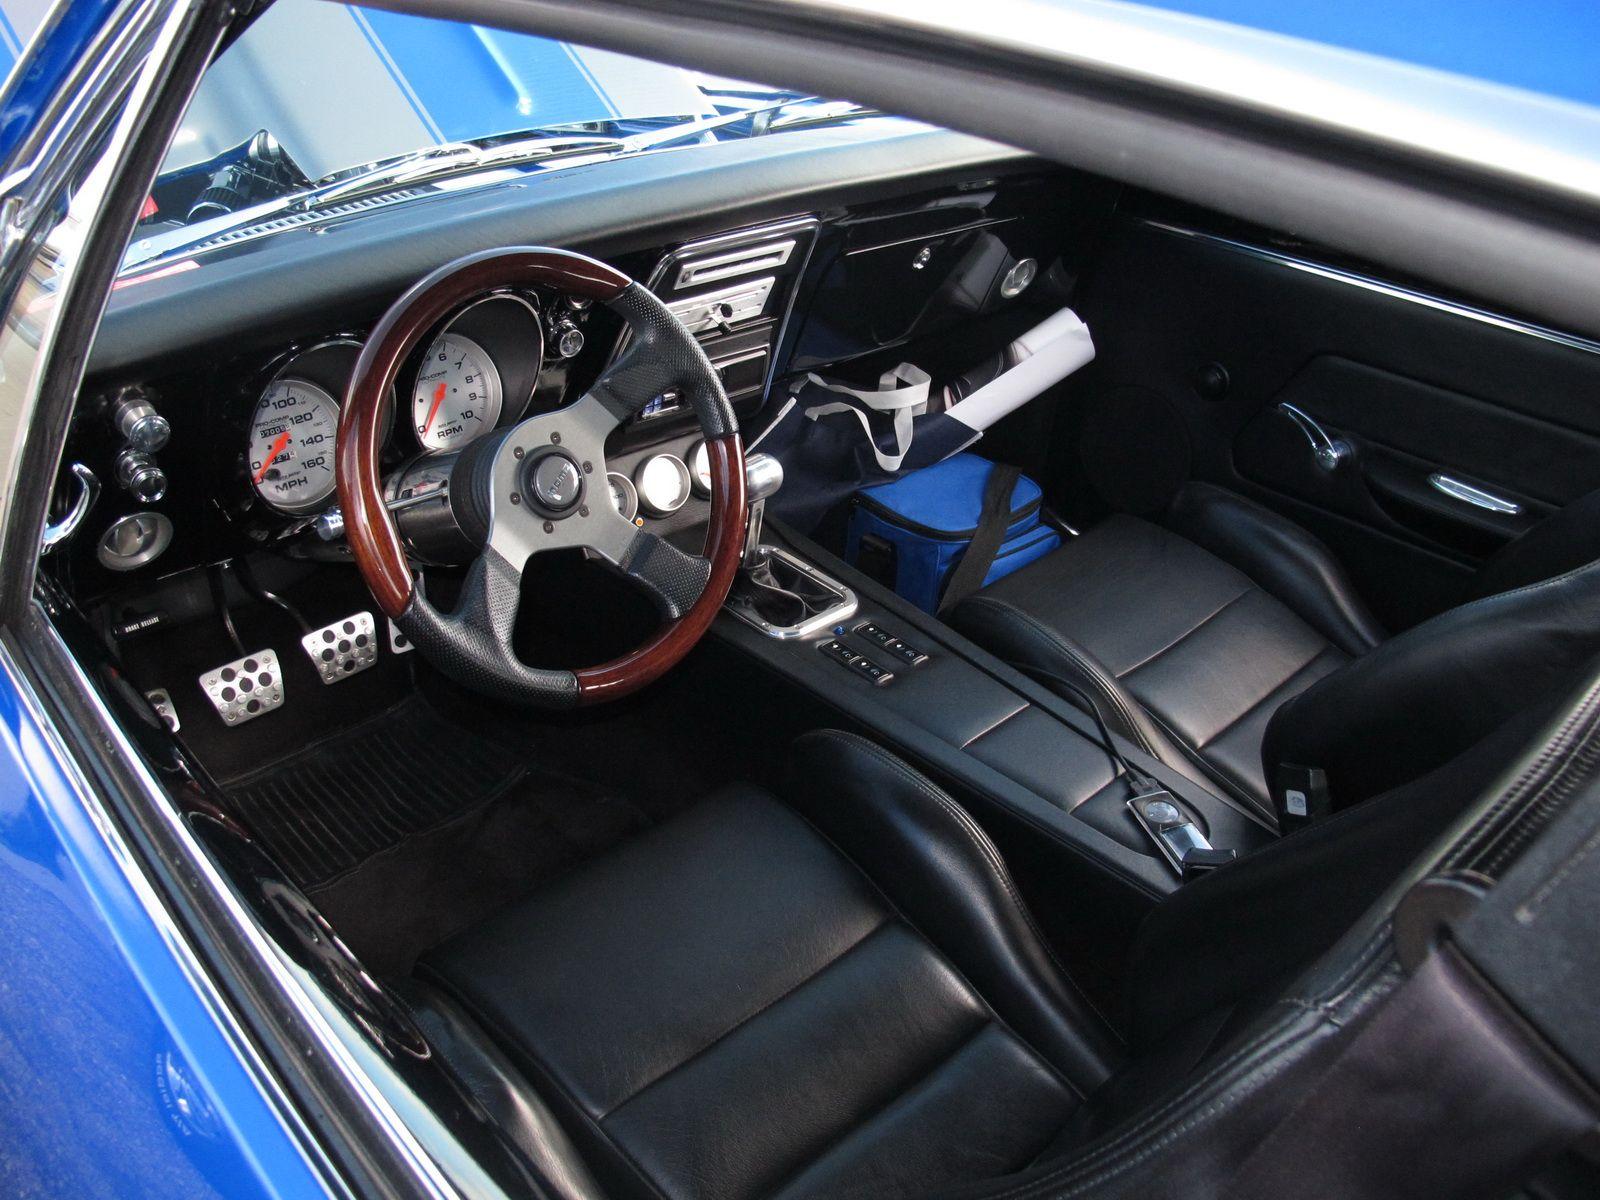 Best Of The Best Chevy Gms Super Chevy Auto Show Camaro Interior Camaro Custom Car Interior